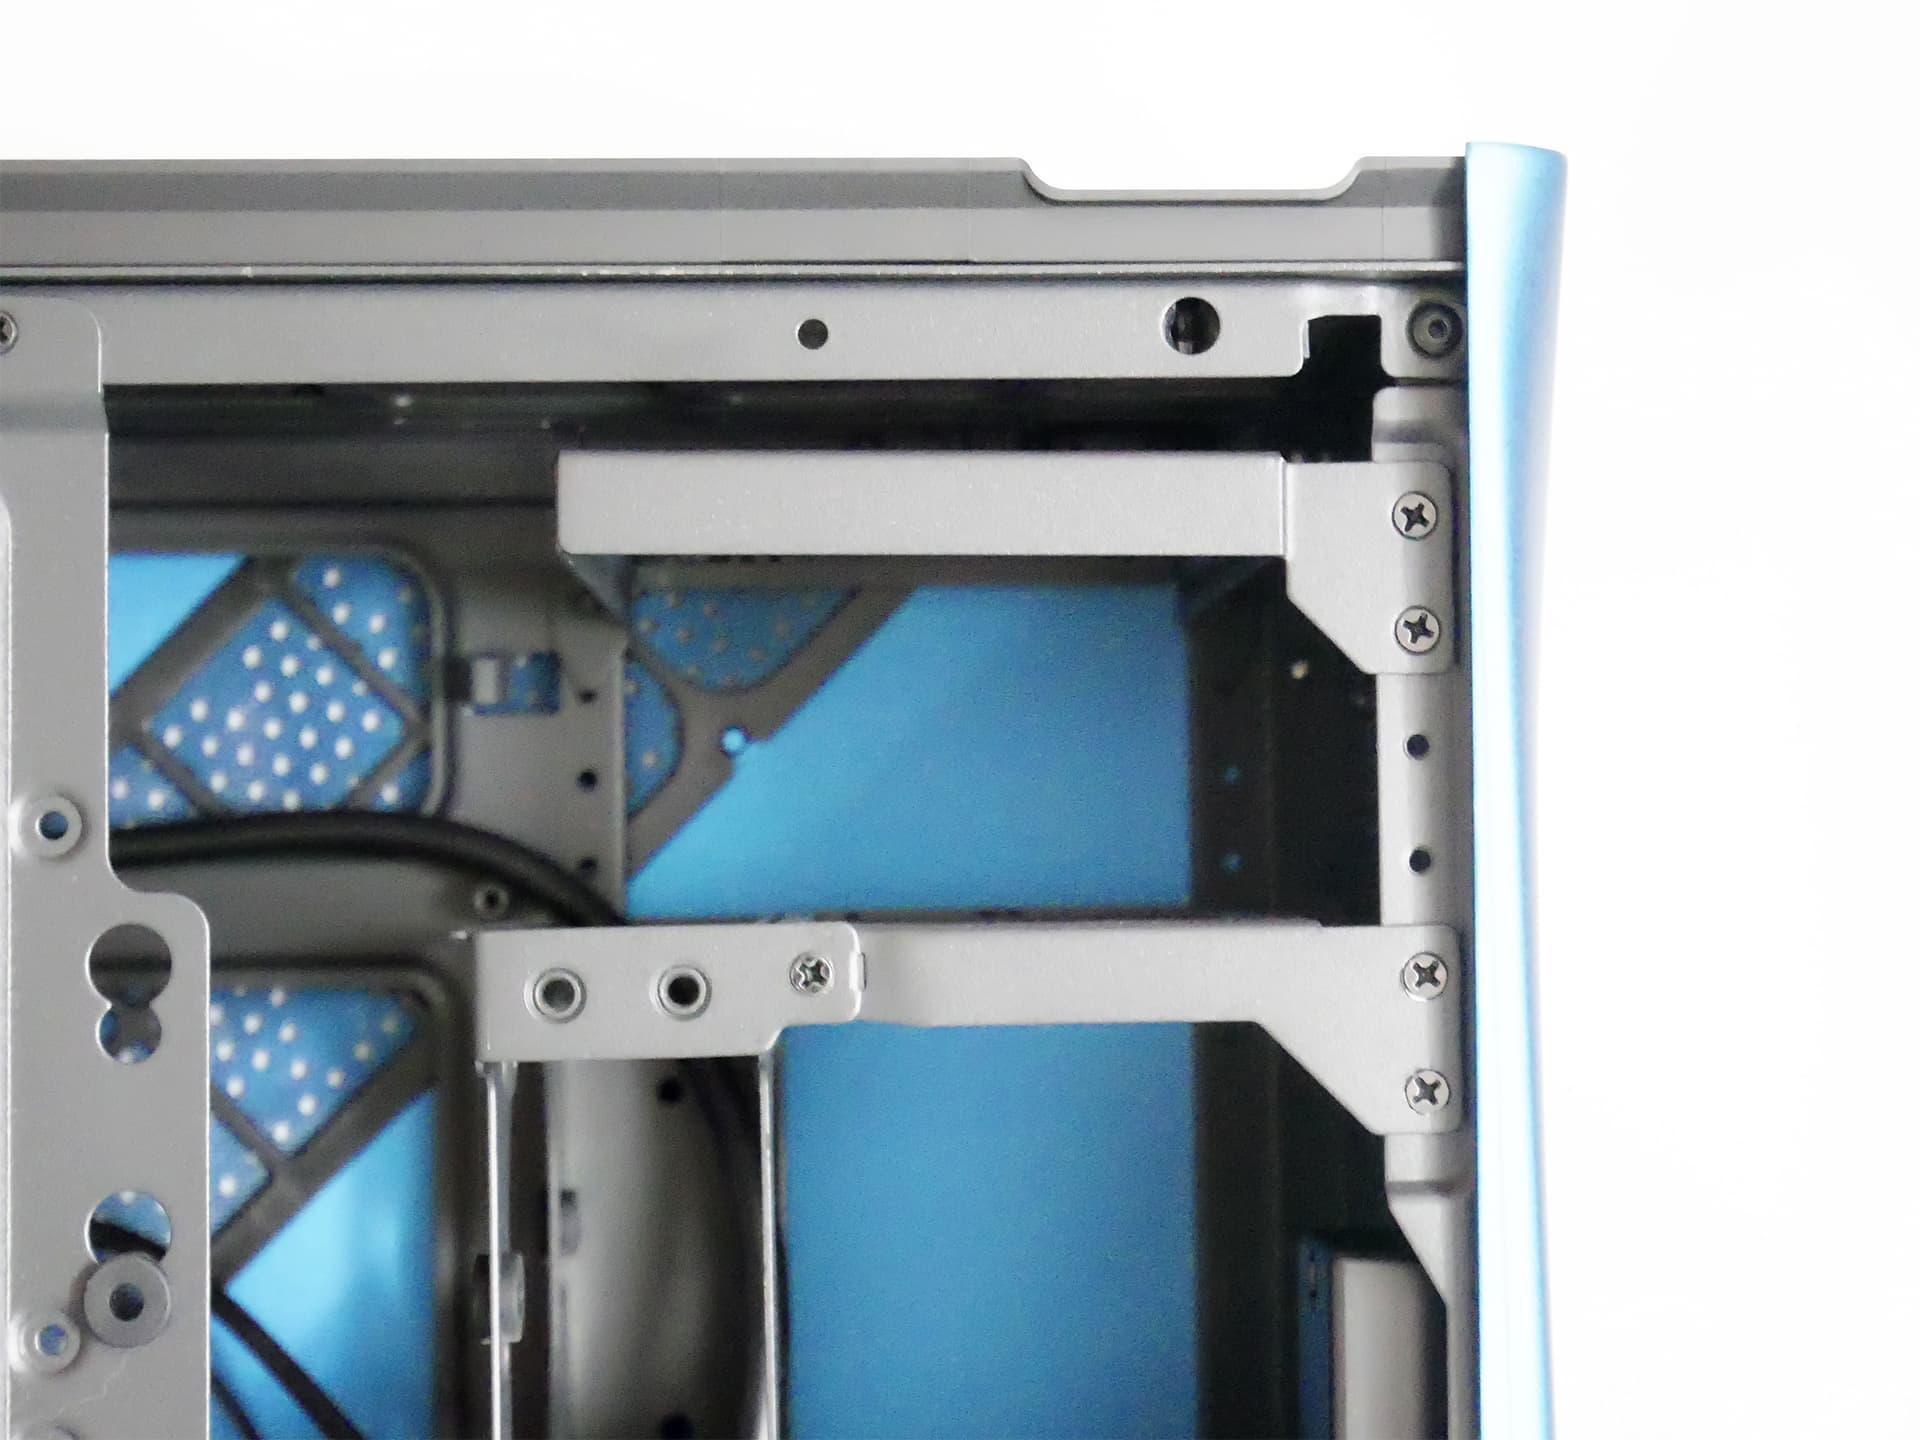 Fractal Design Era ITX ATX電源ブラケット